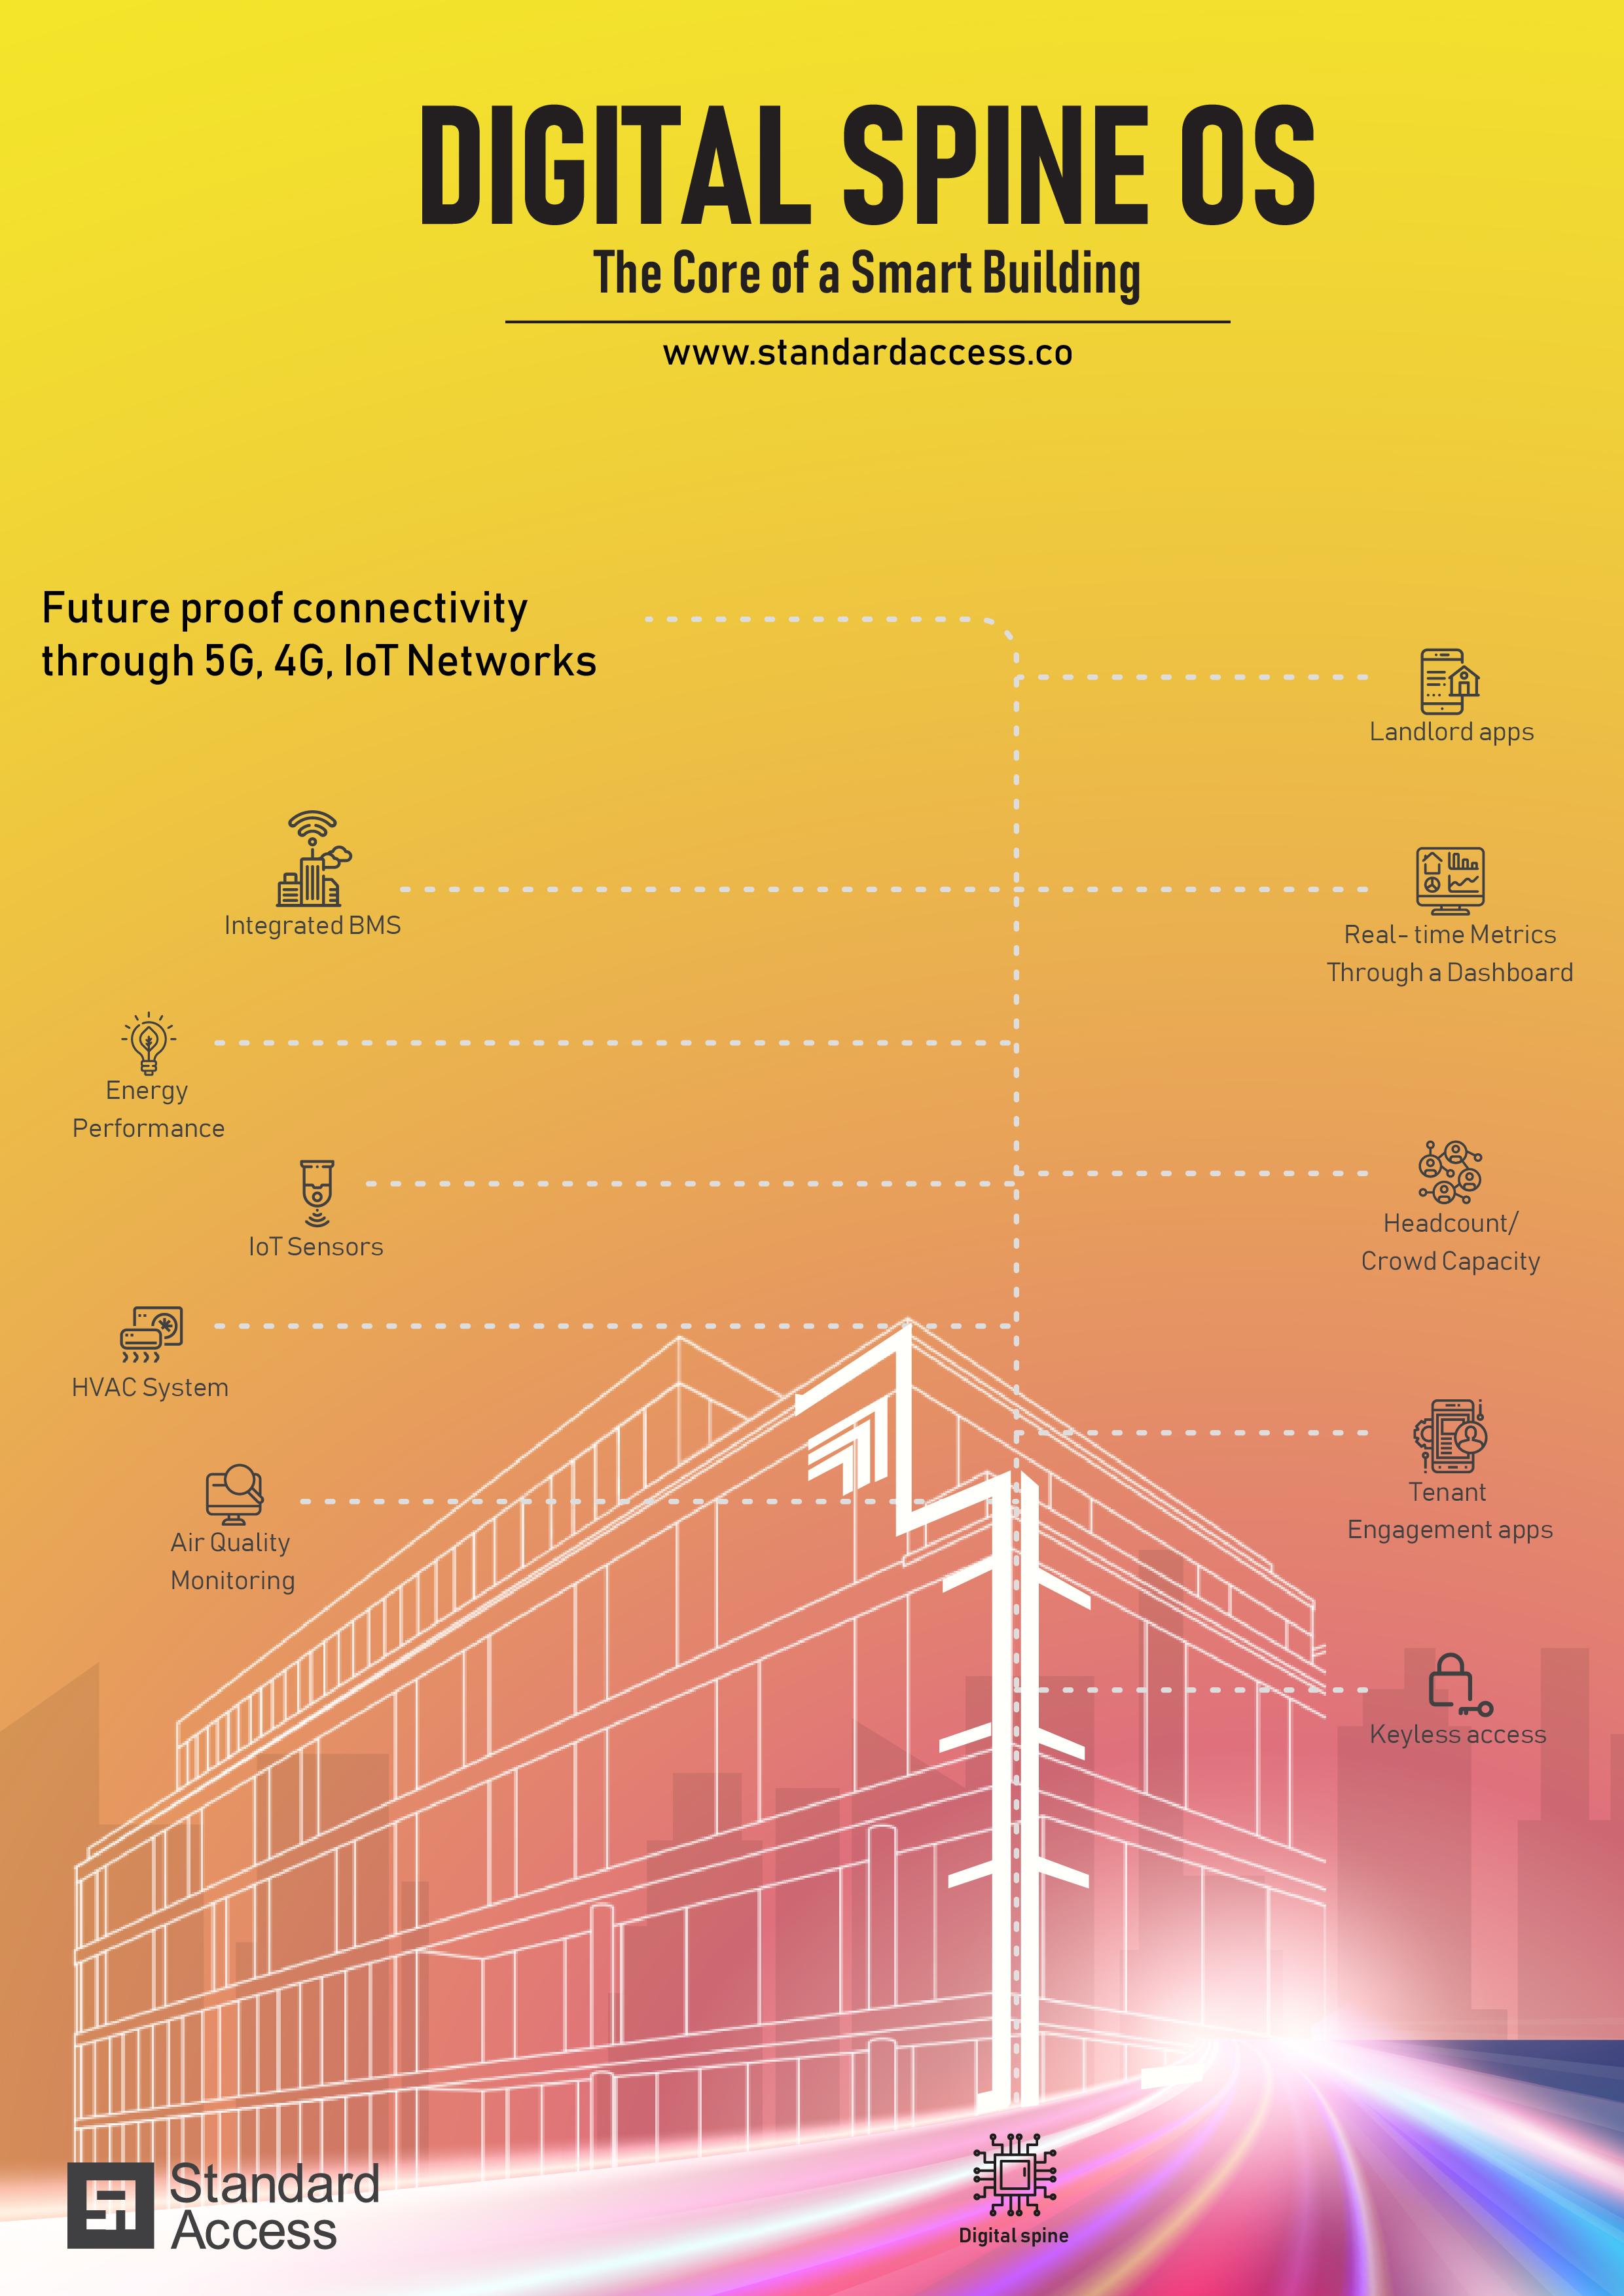 Digital Spine IOS for Smart Buildings